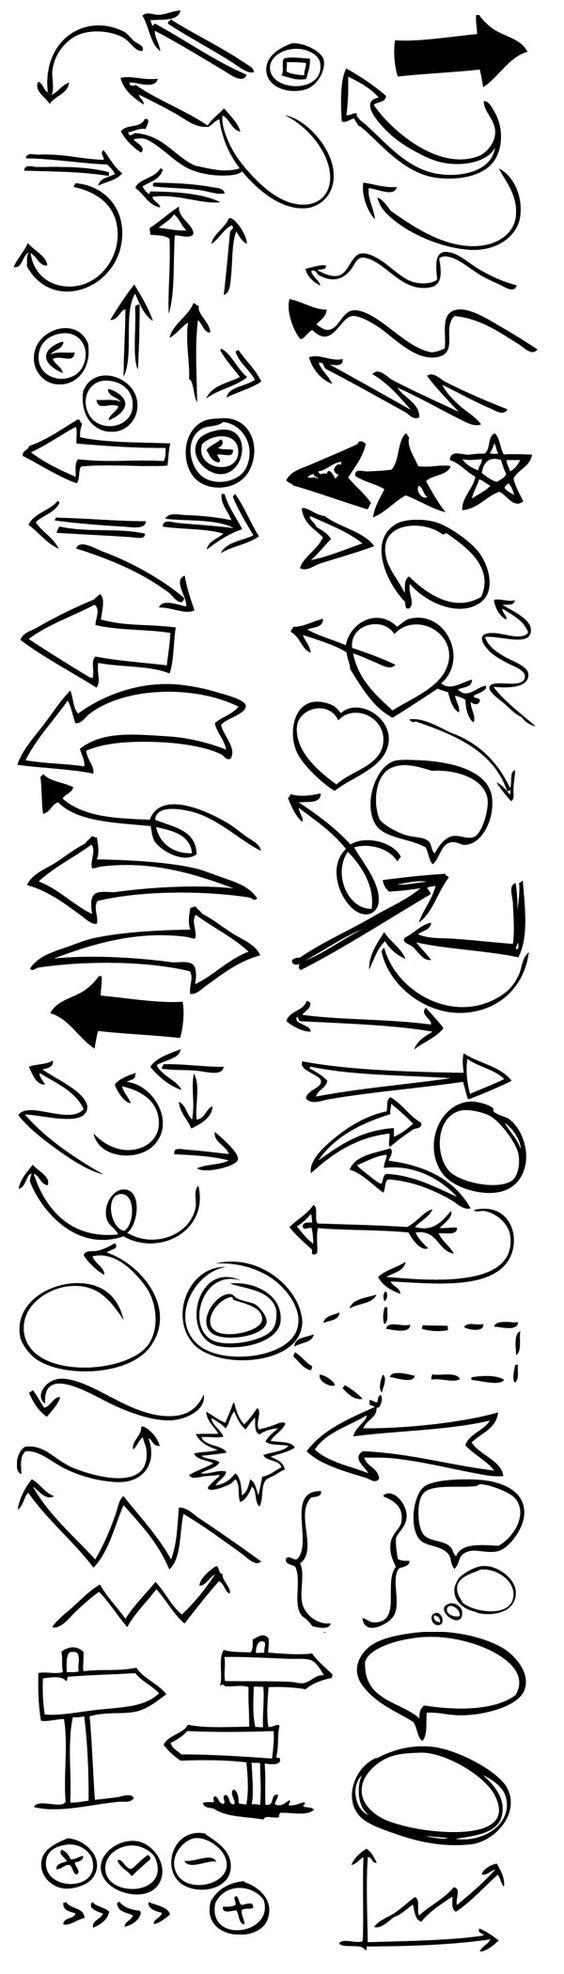 handdrawn-arrow-symbols-brushes: